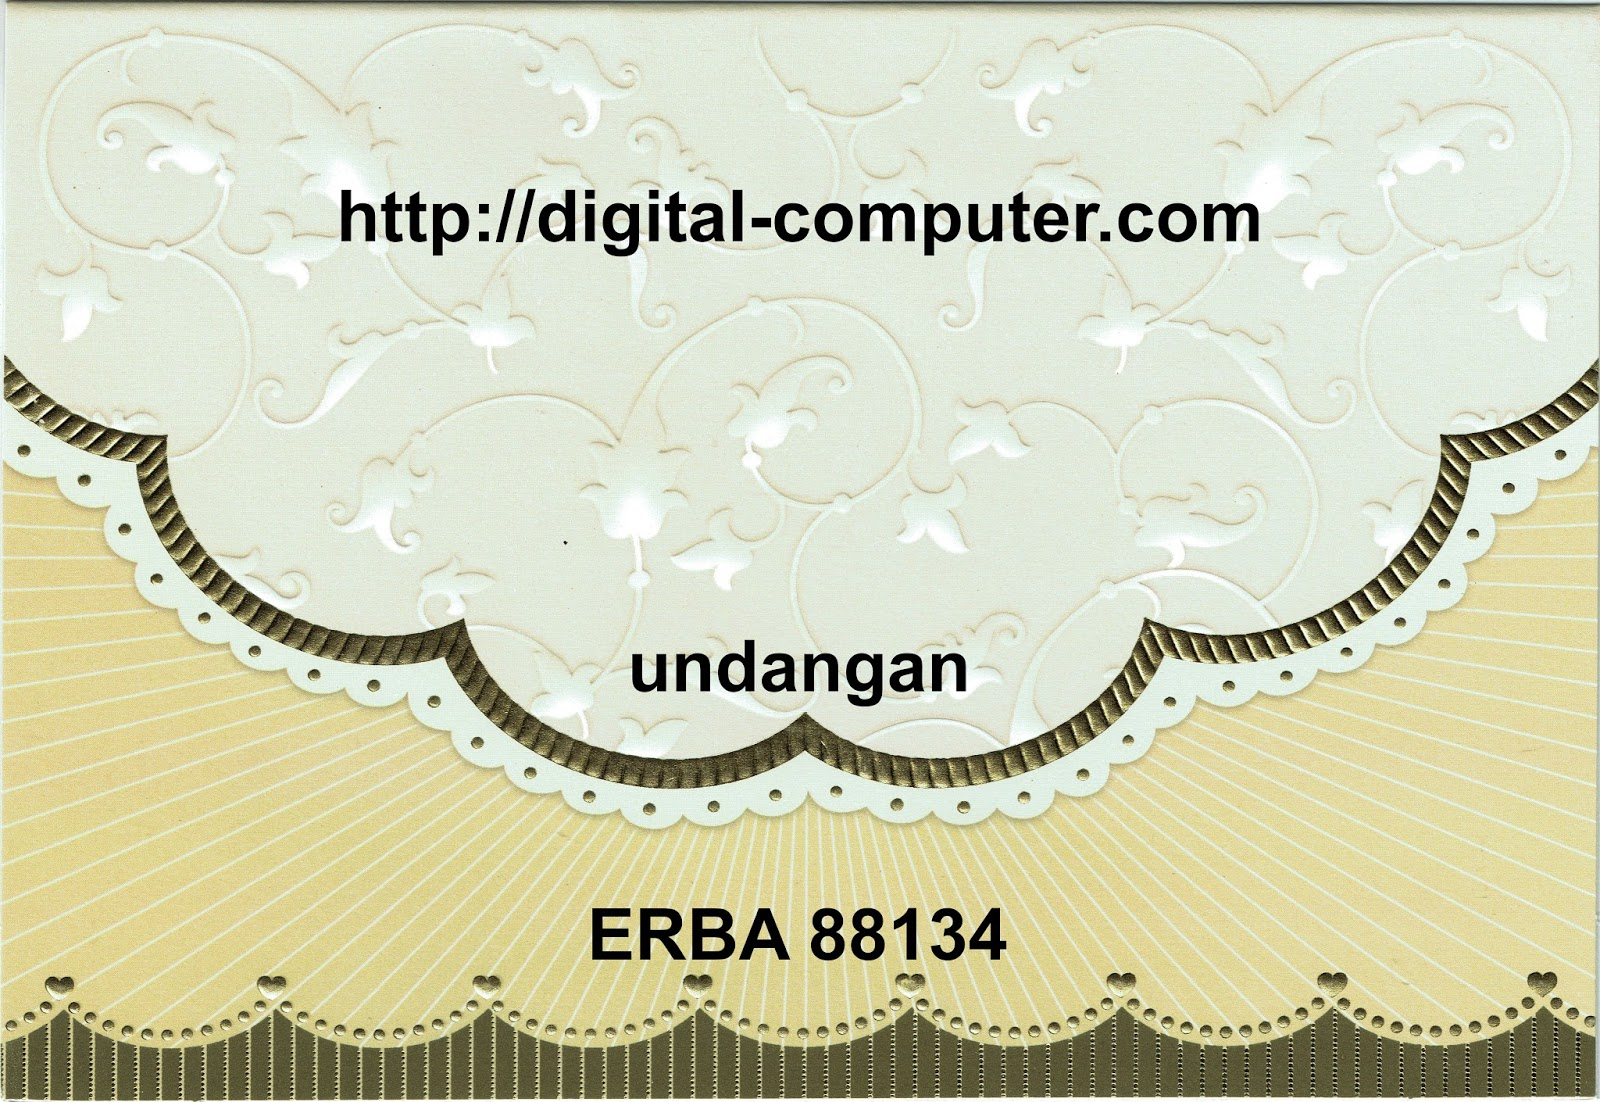 Undangan Softcover ERBA 88134